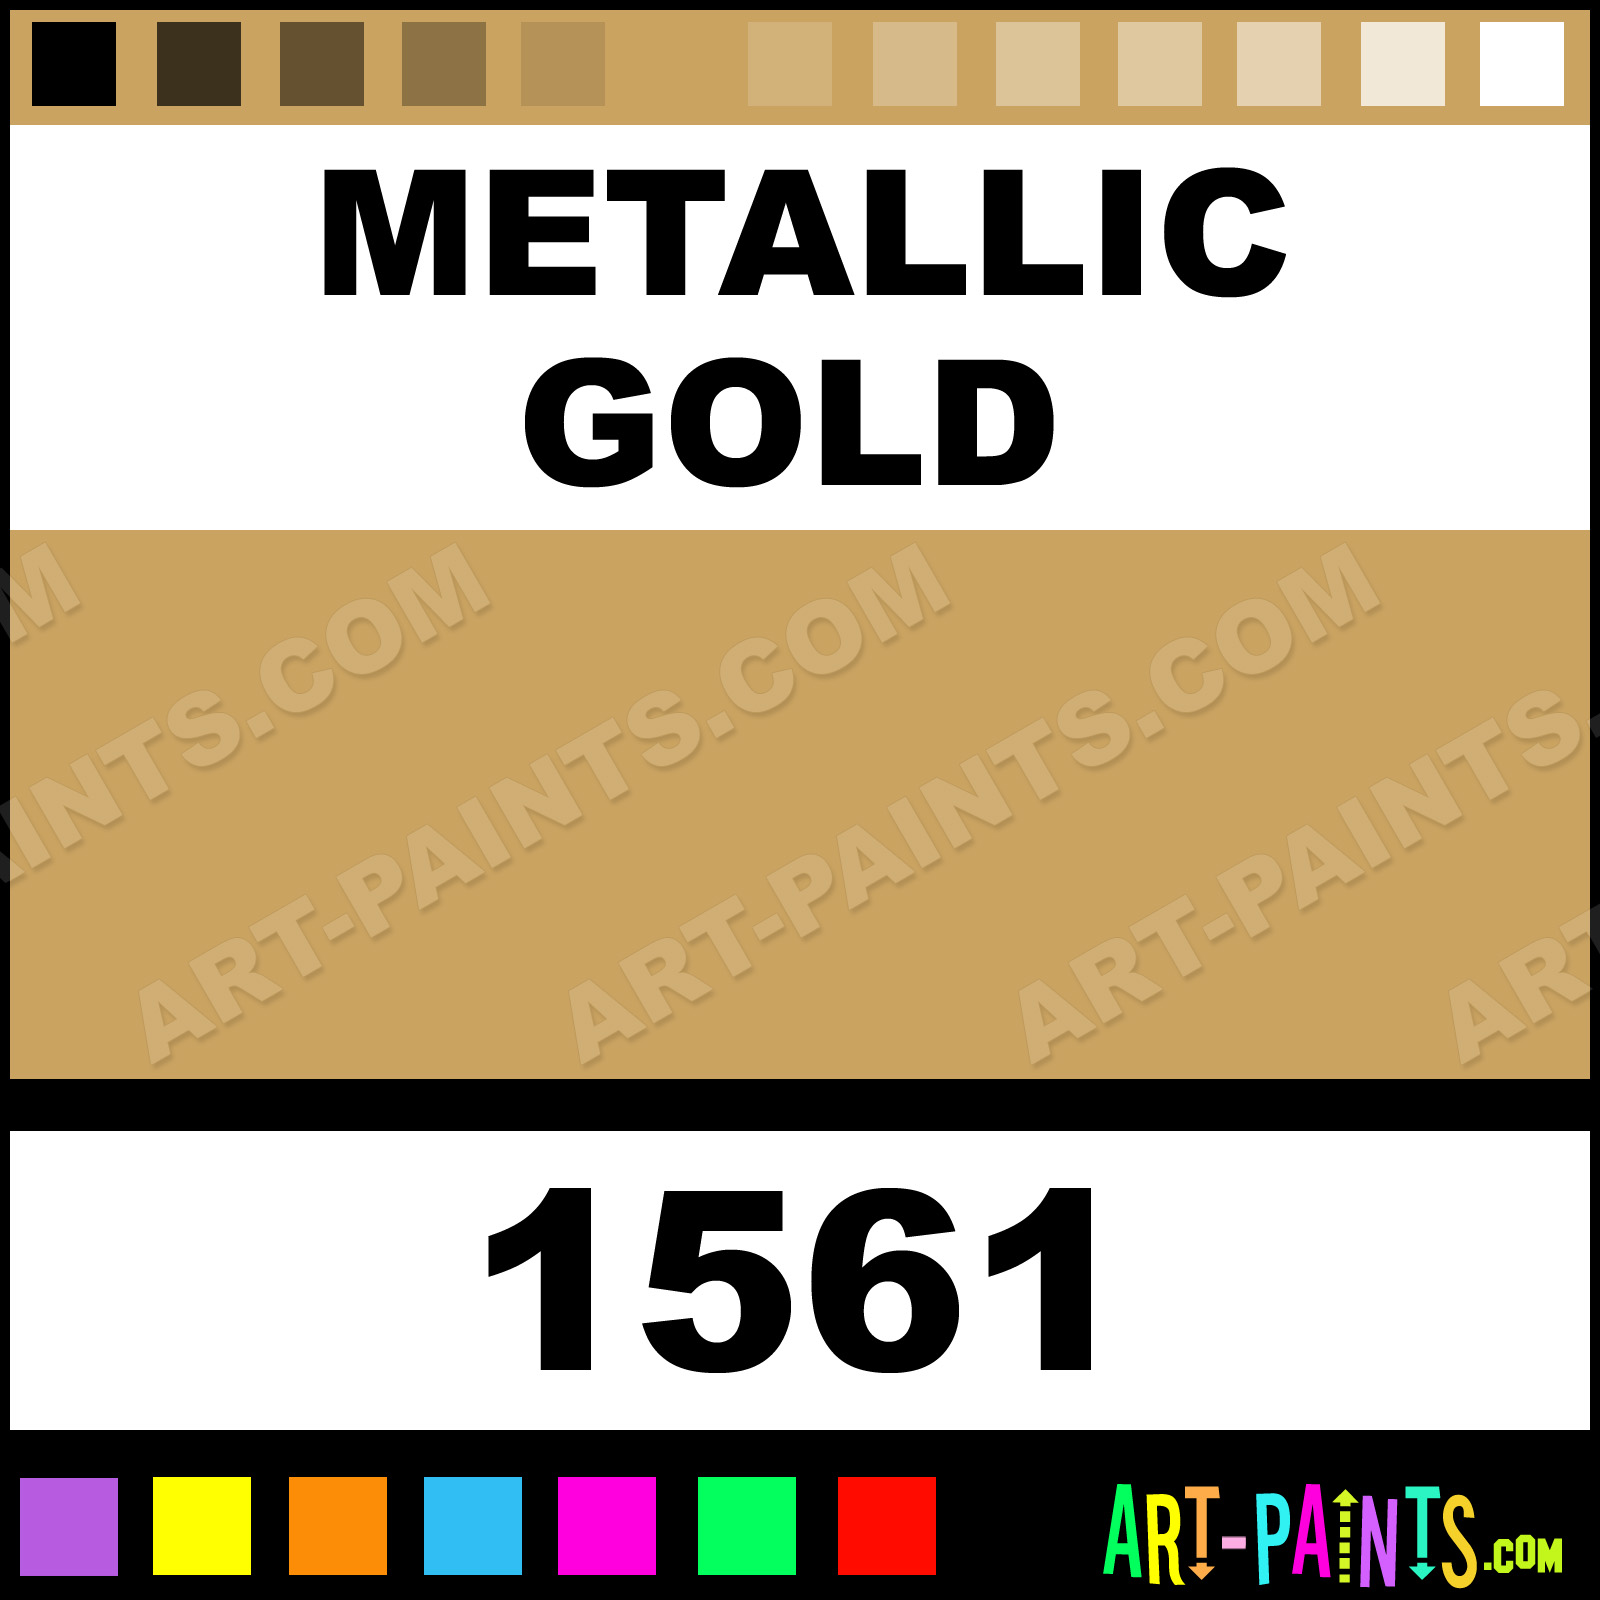 Metallic gold lumiere foam styrofoam foamy paints 1561 metallic gold lumiere foam styrofoam foamy paints 1561 metallic gold paint metallic gold color jacquard lumiere paint caa360 art paints geenschuldenfo Choice Image